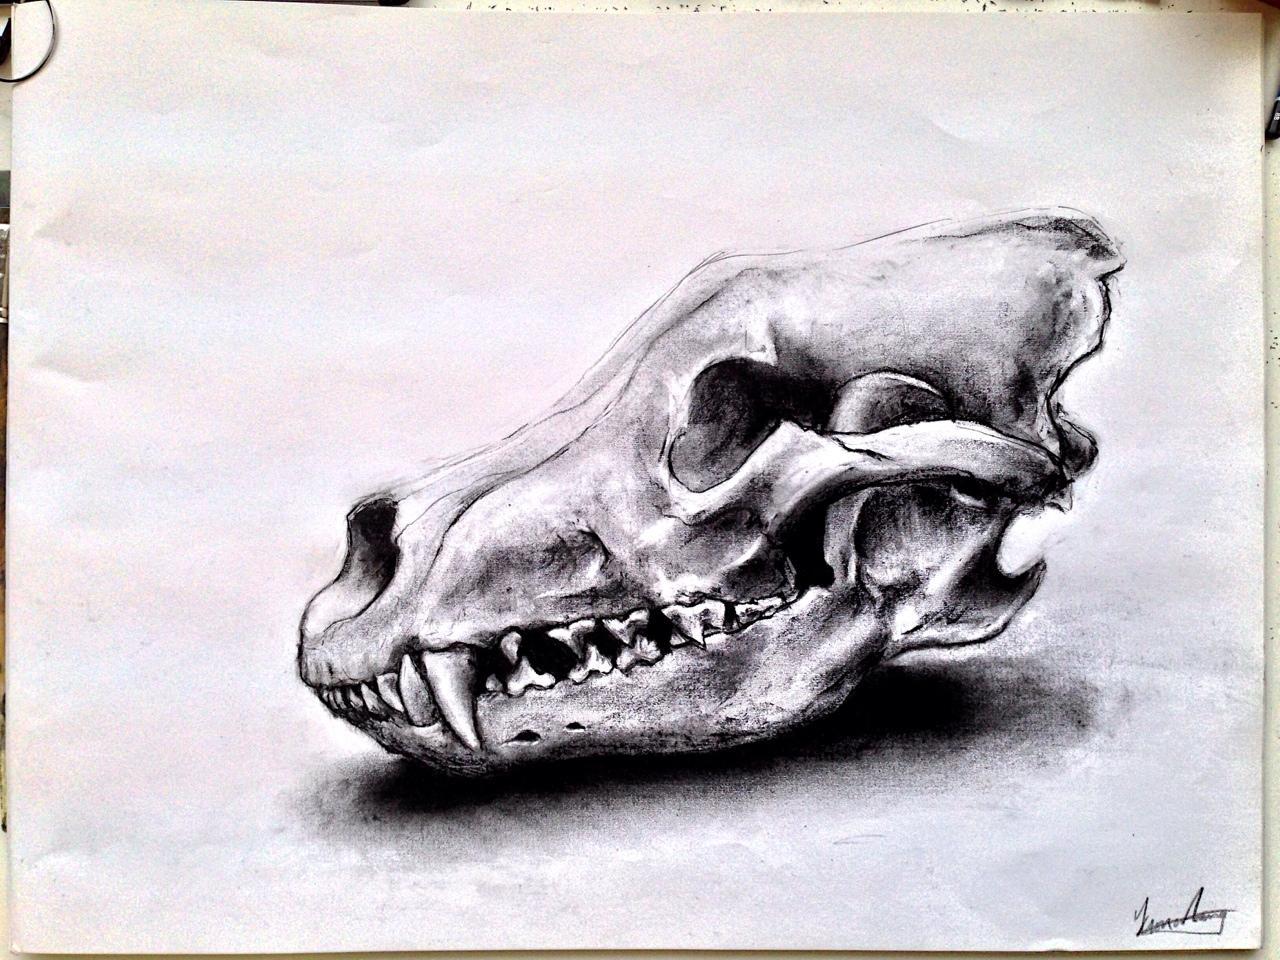 1280x960 Animal Skull Drawings